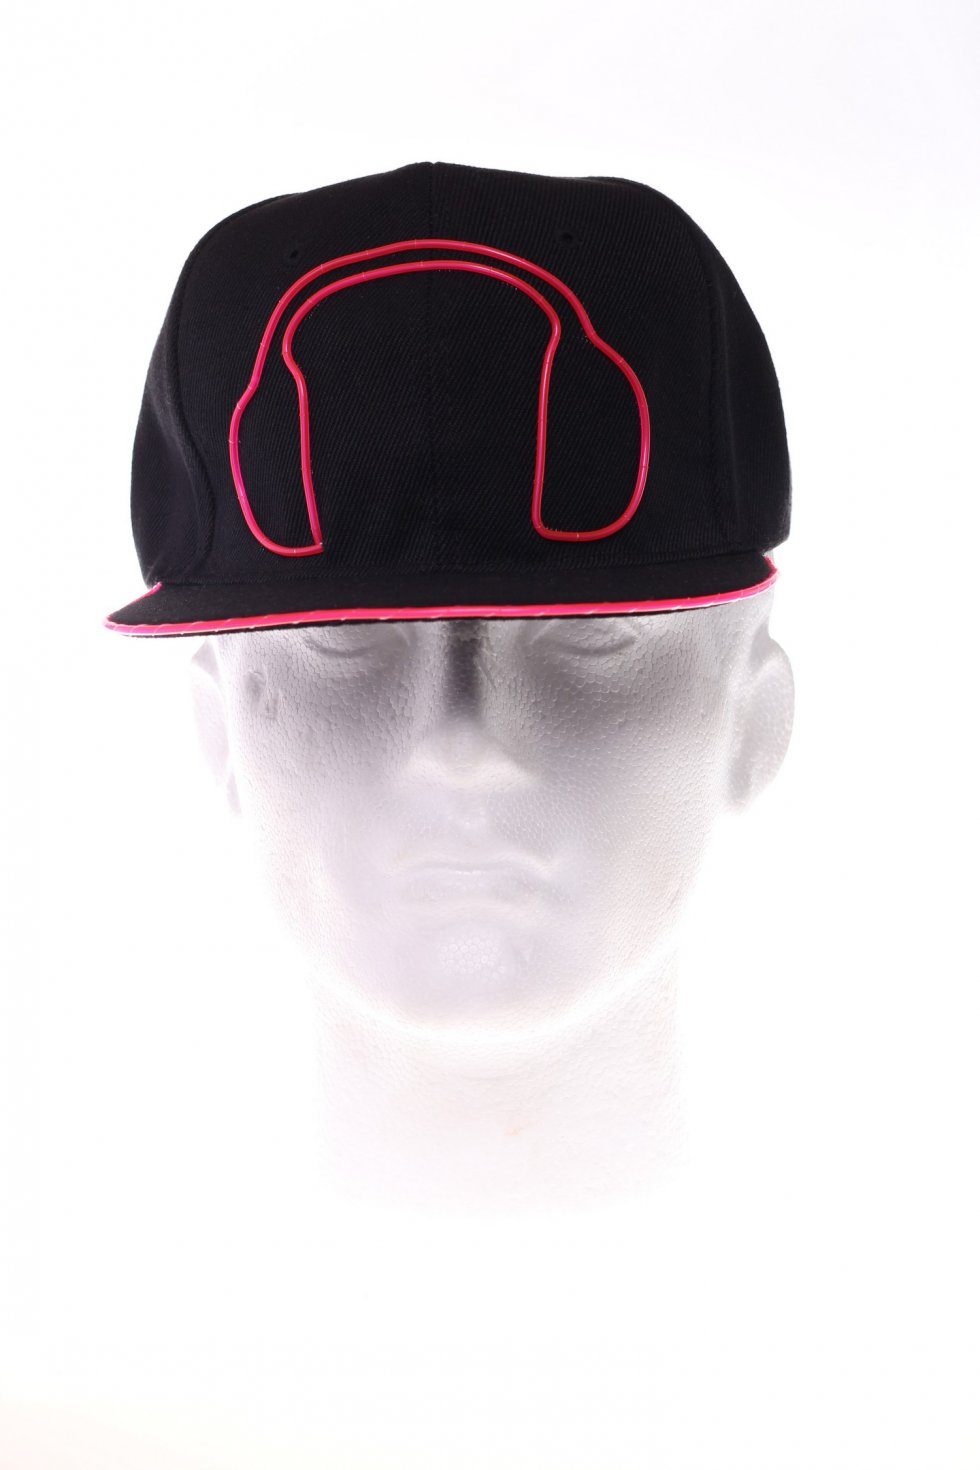 Lighting Caps Headphones Pink Cool Mania